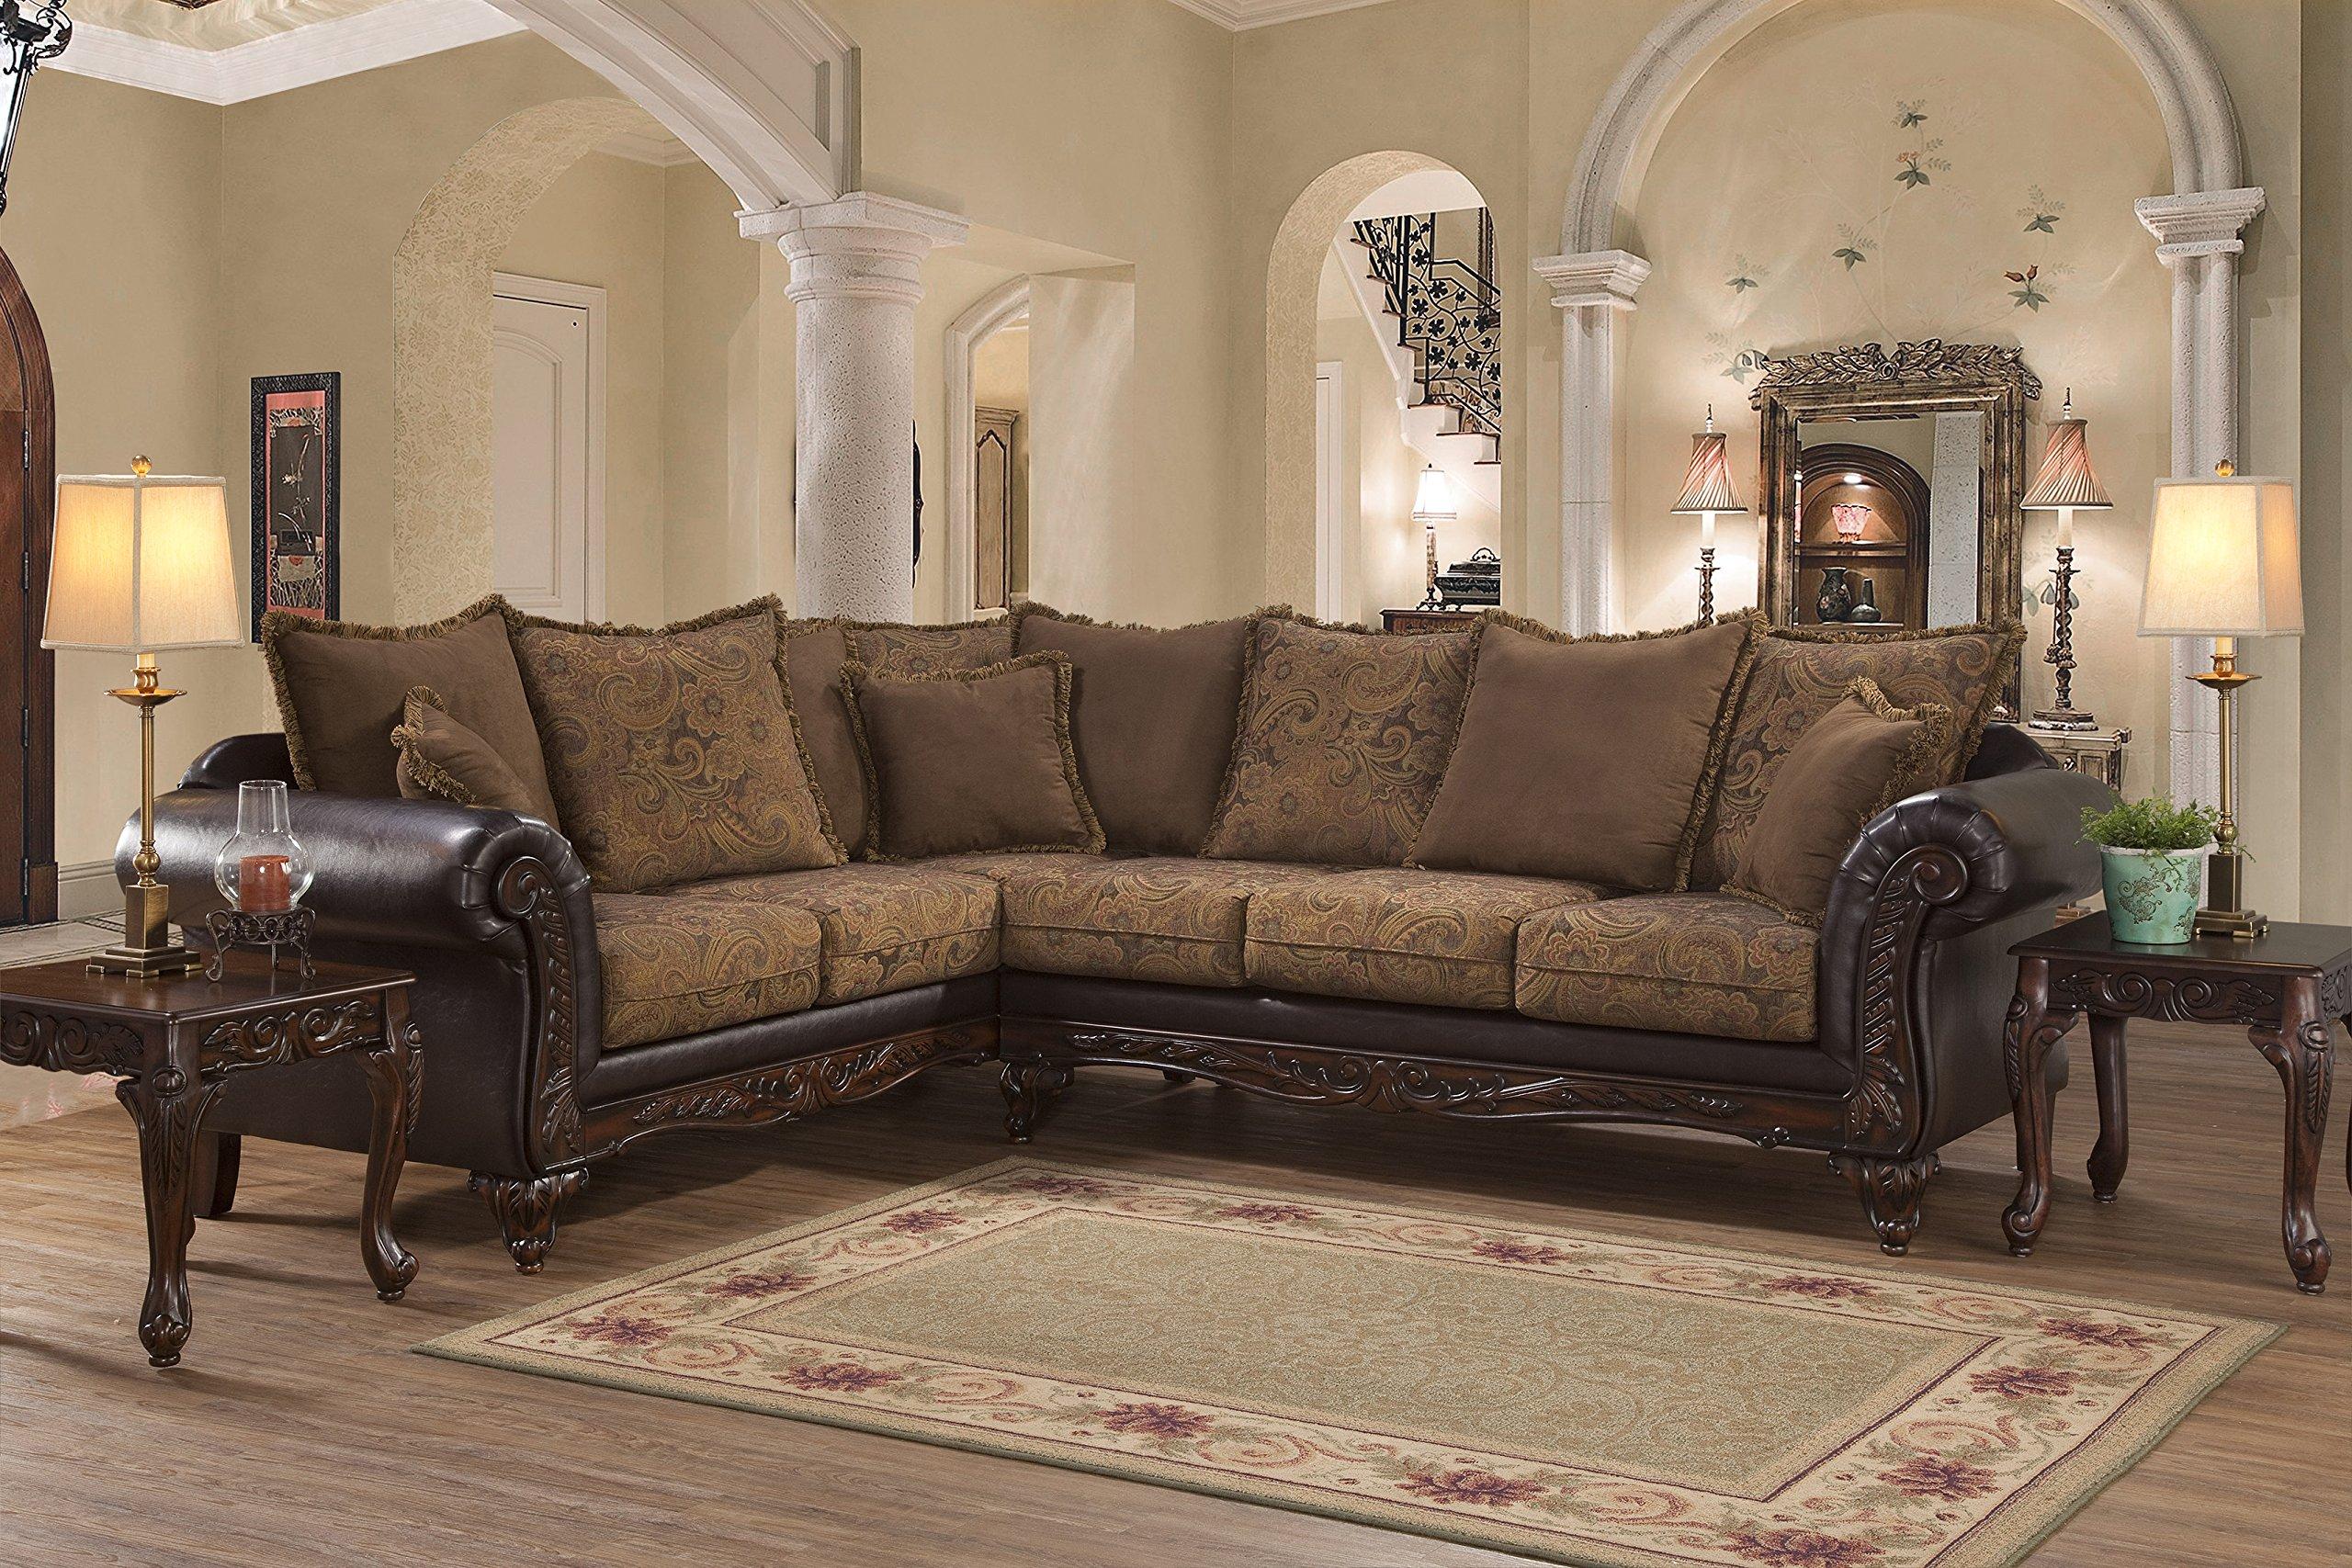 Roundhill Furniture LHU7685SEC San Marino Chocolate Solid Wood Frame Sectional Sofa